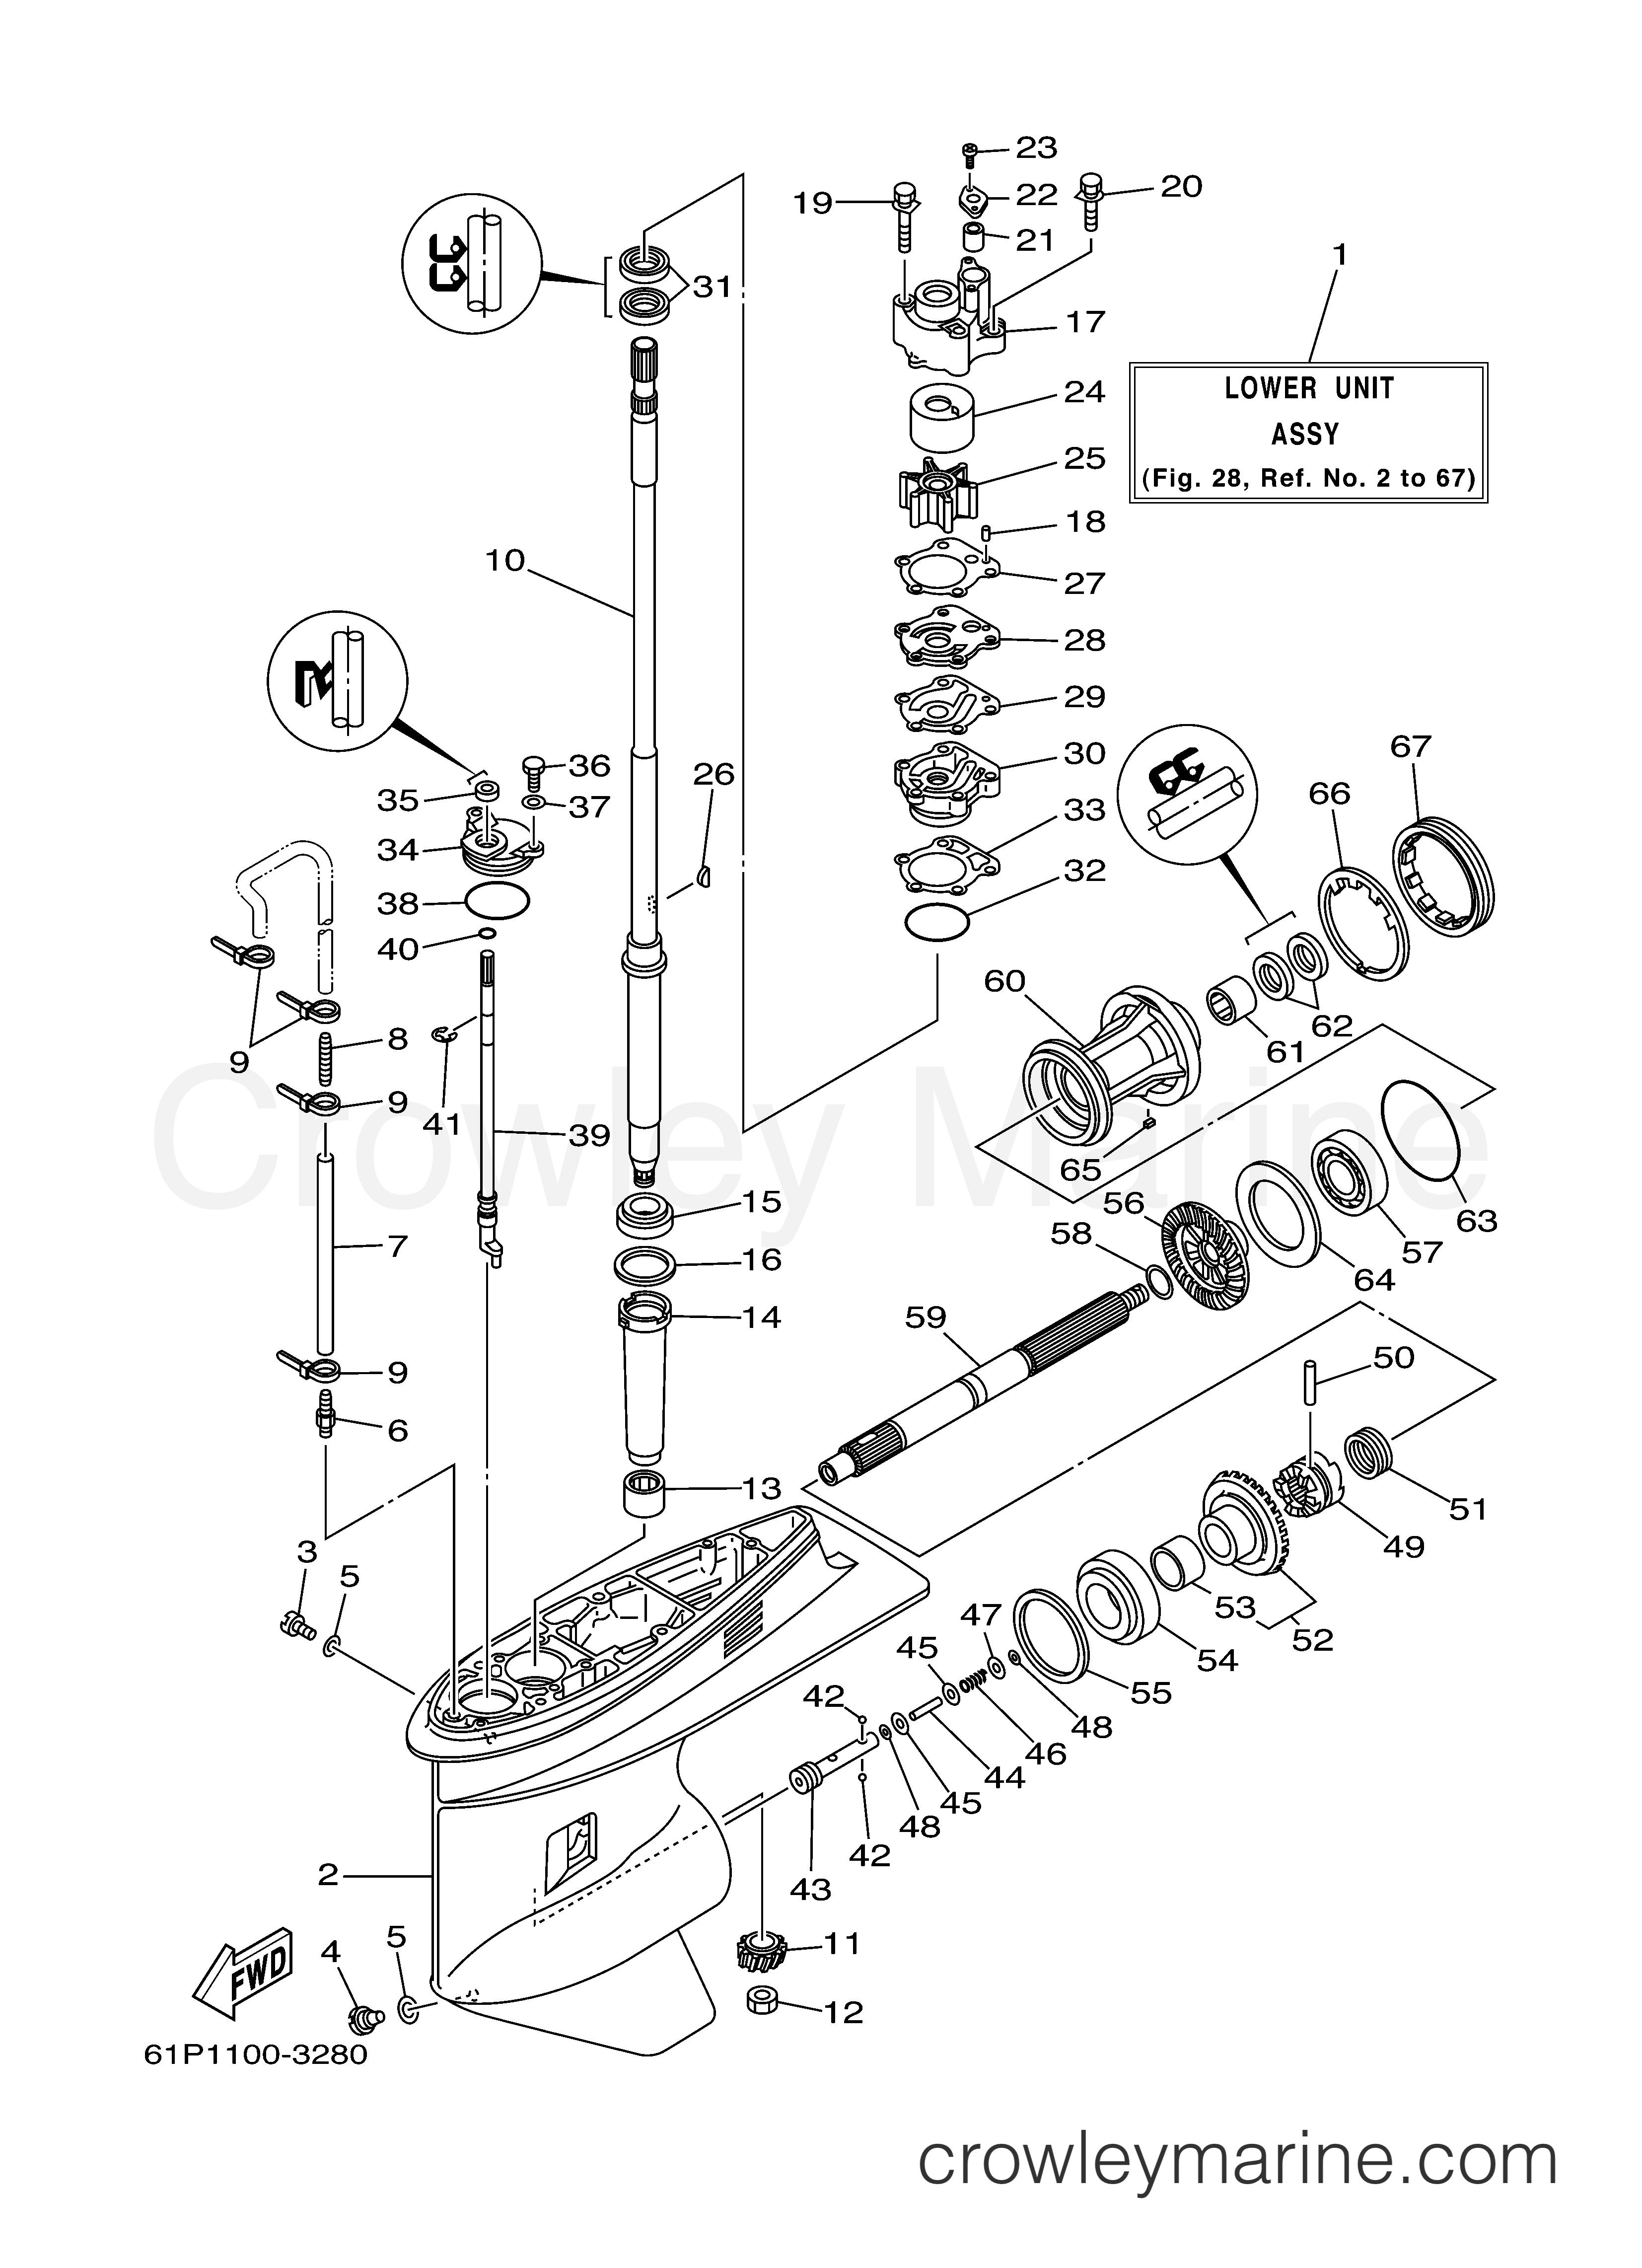 lower casing drive 1 2003 yamaha outboard 90hp f90tlrb crowley Yamaha Bear Tracker 250 Parts Diagram 2003 yamaha outboard 90hp f90tlrb lower casing drive 1 section